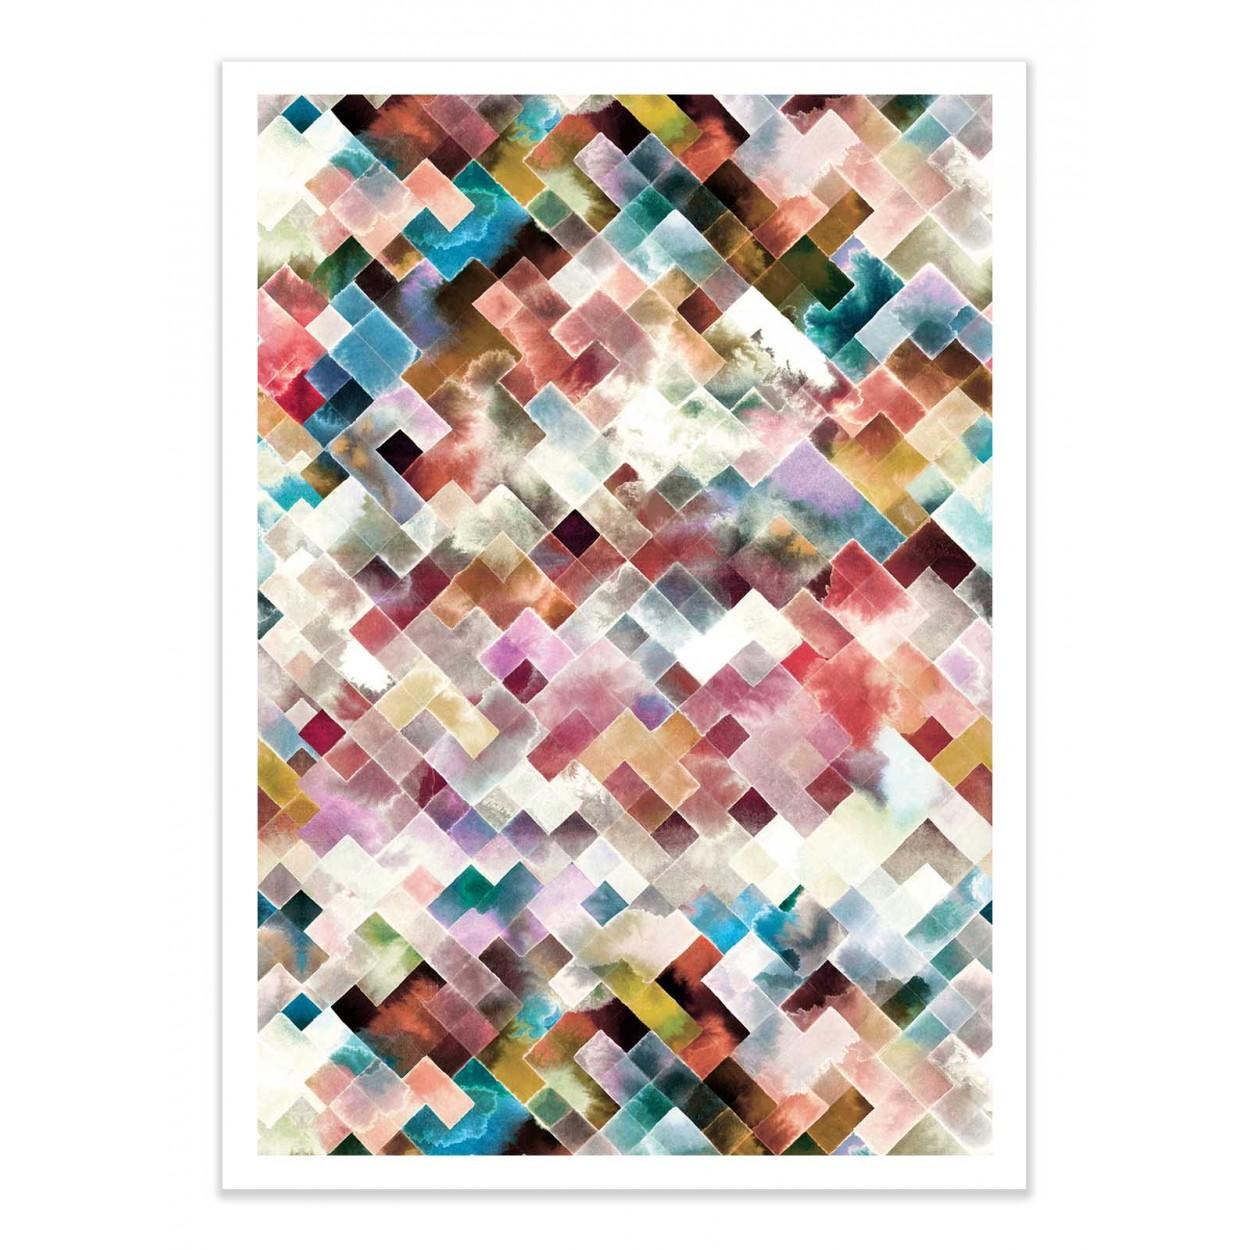 MOODY GEOMETRY PINK NEON -   Affiche d'art 50 x 70 cm